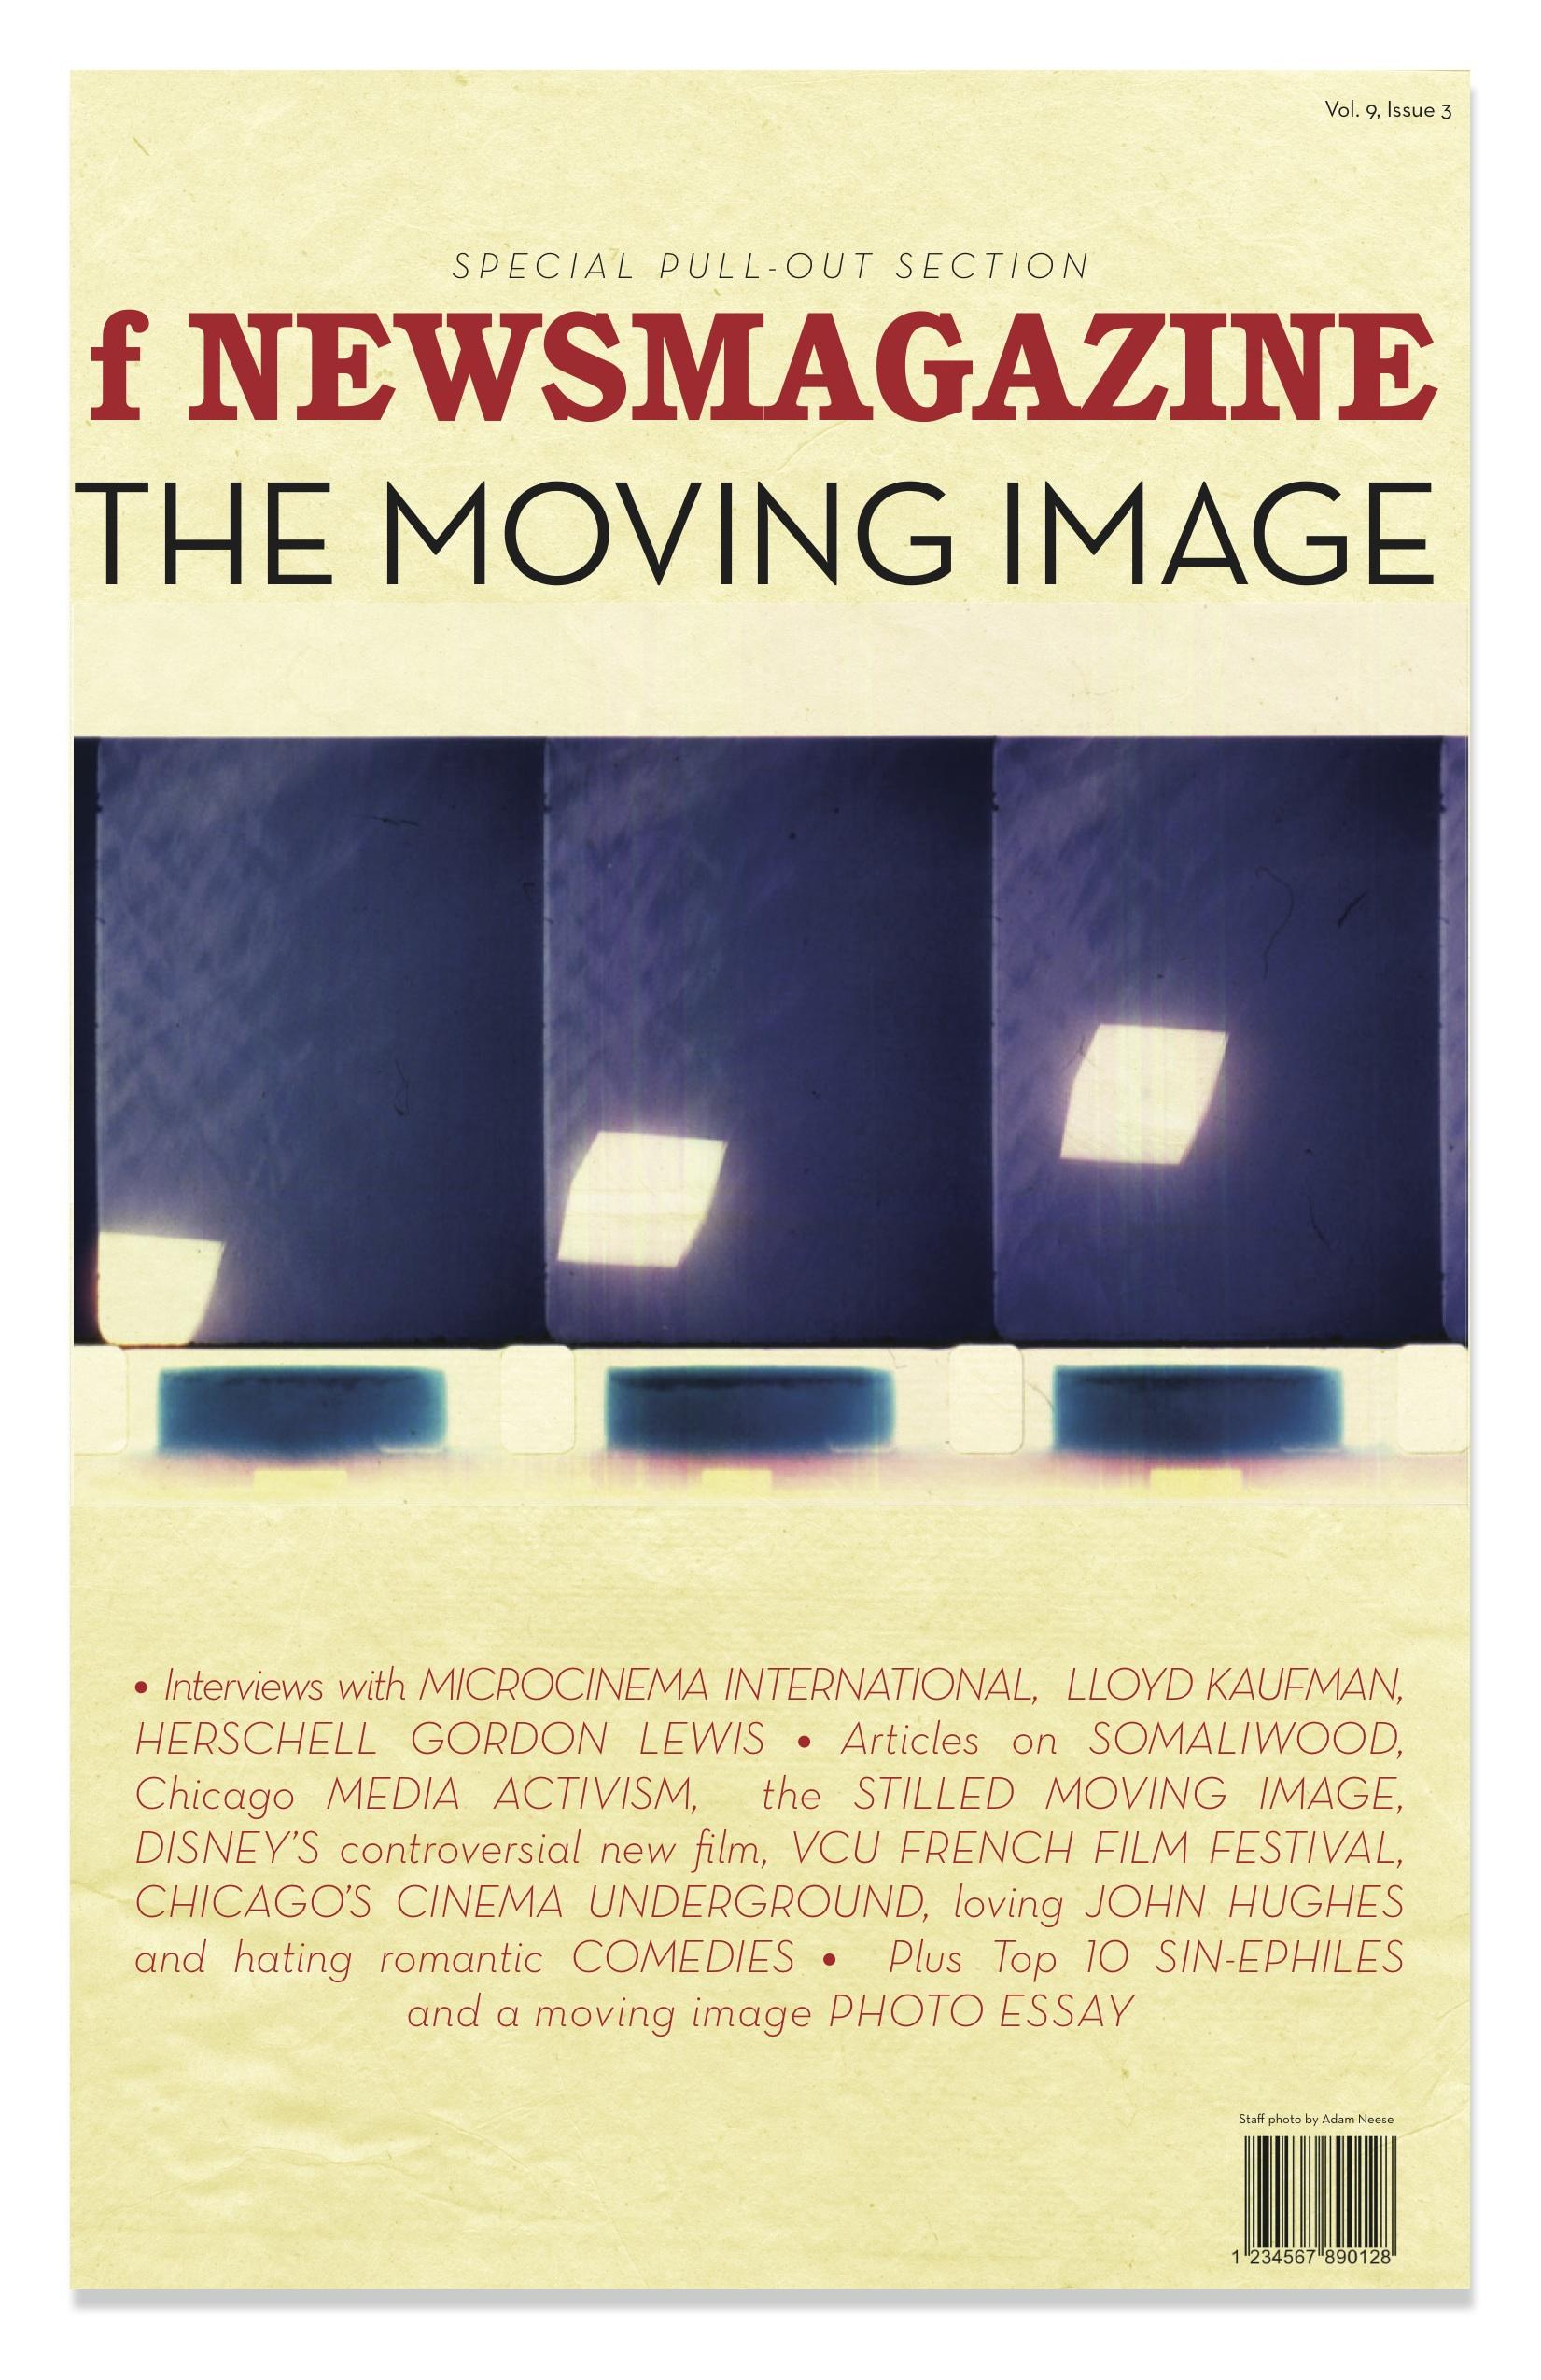 Film Issue insert cover